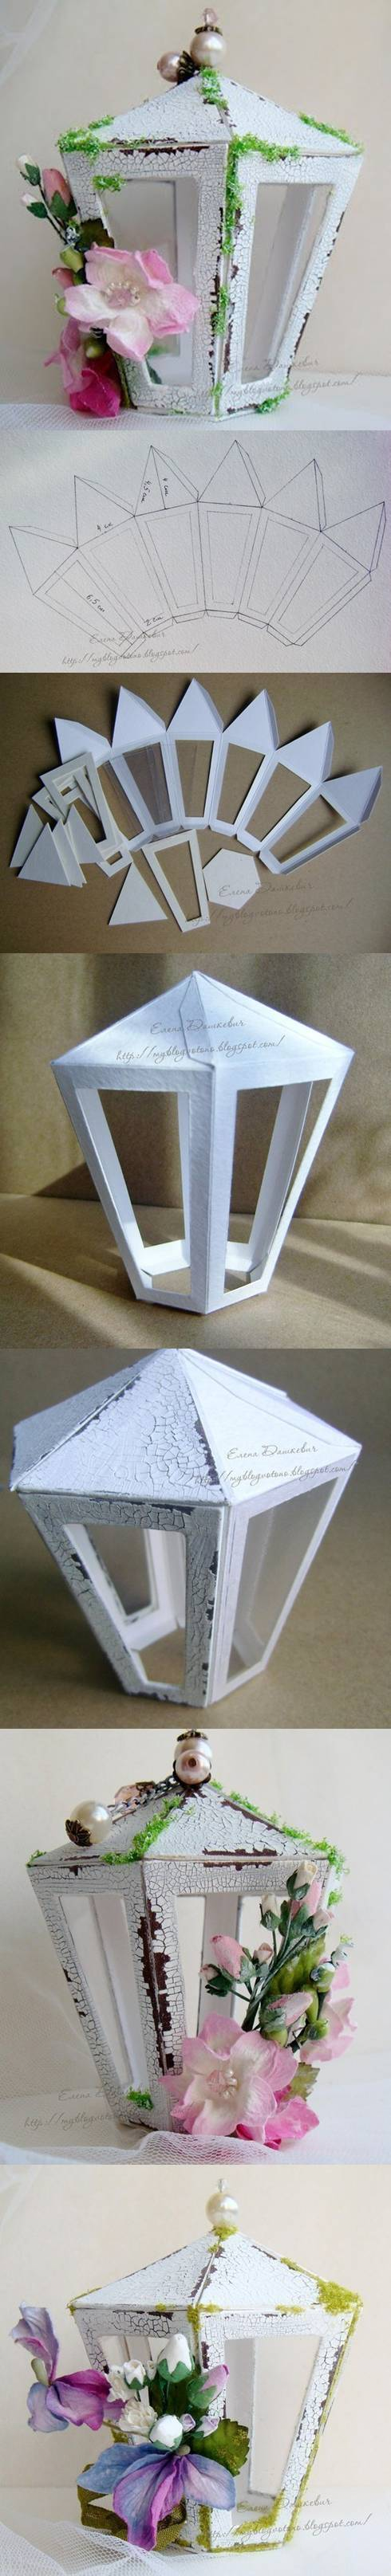 DIY-Cardboard-Latern-Template